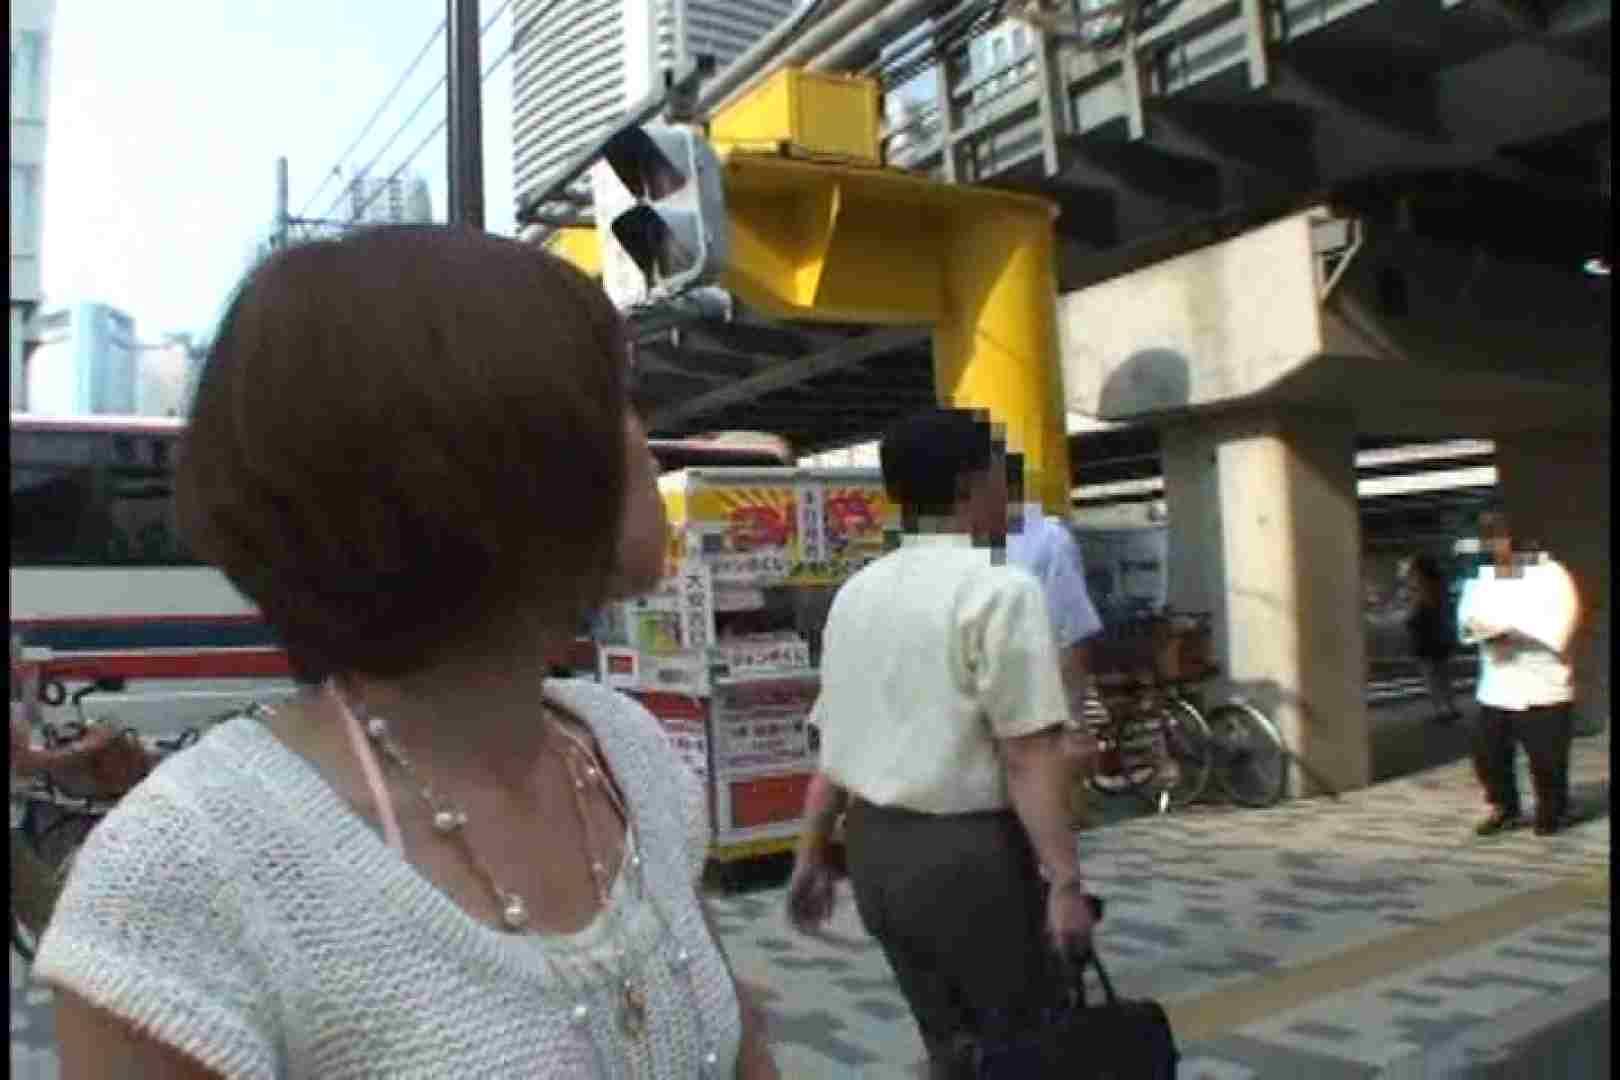 JDハンター全国ツアー vol.026 前編 女子大生のエロ動画  82PIX 2